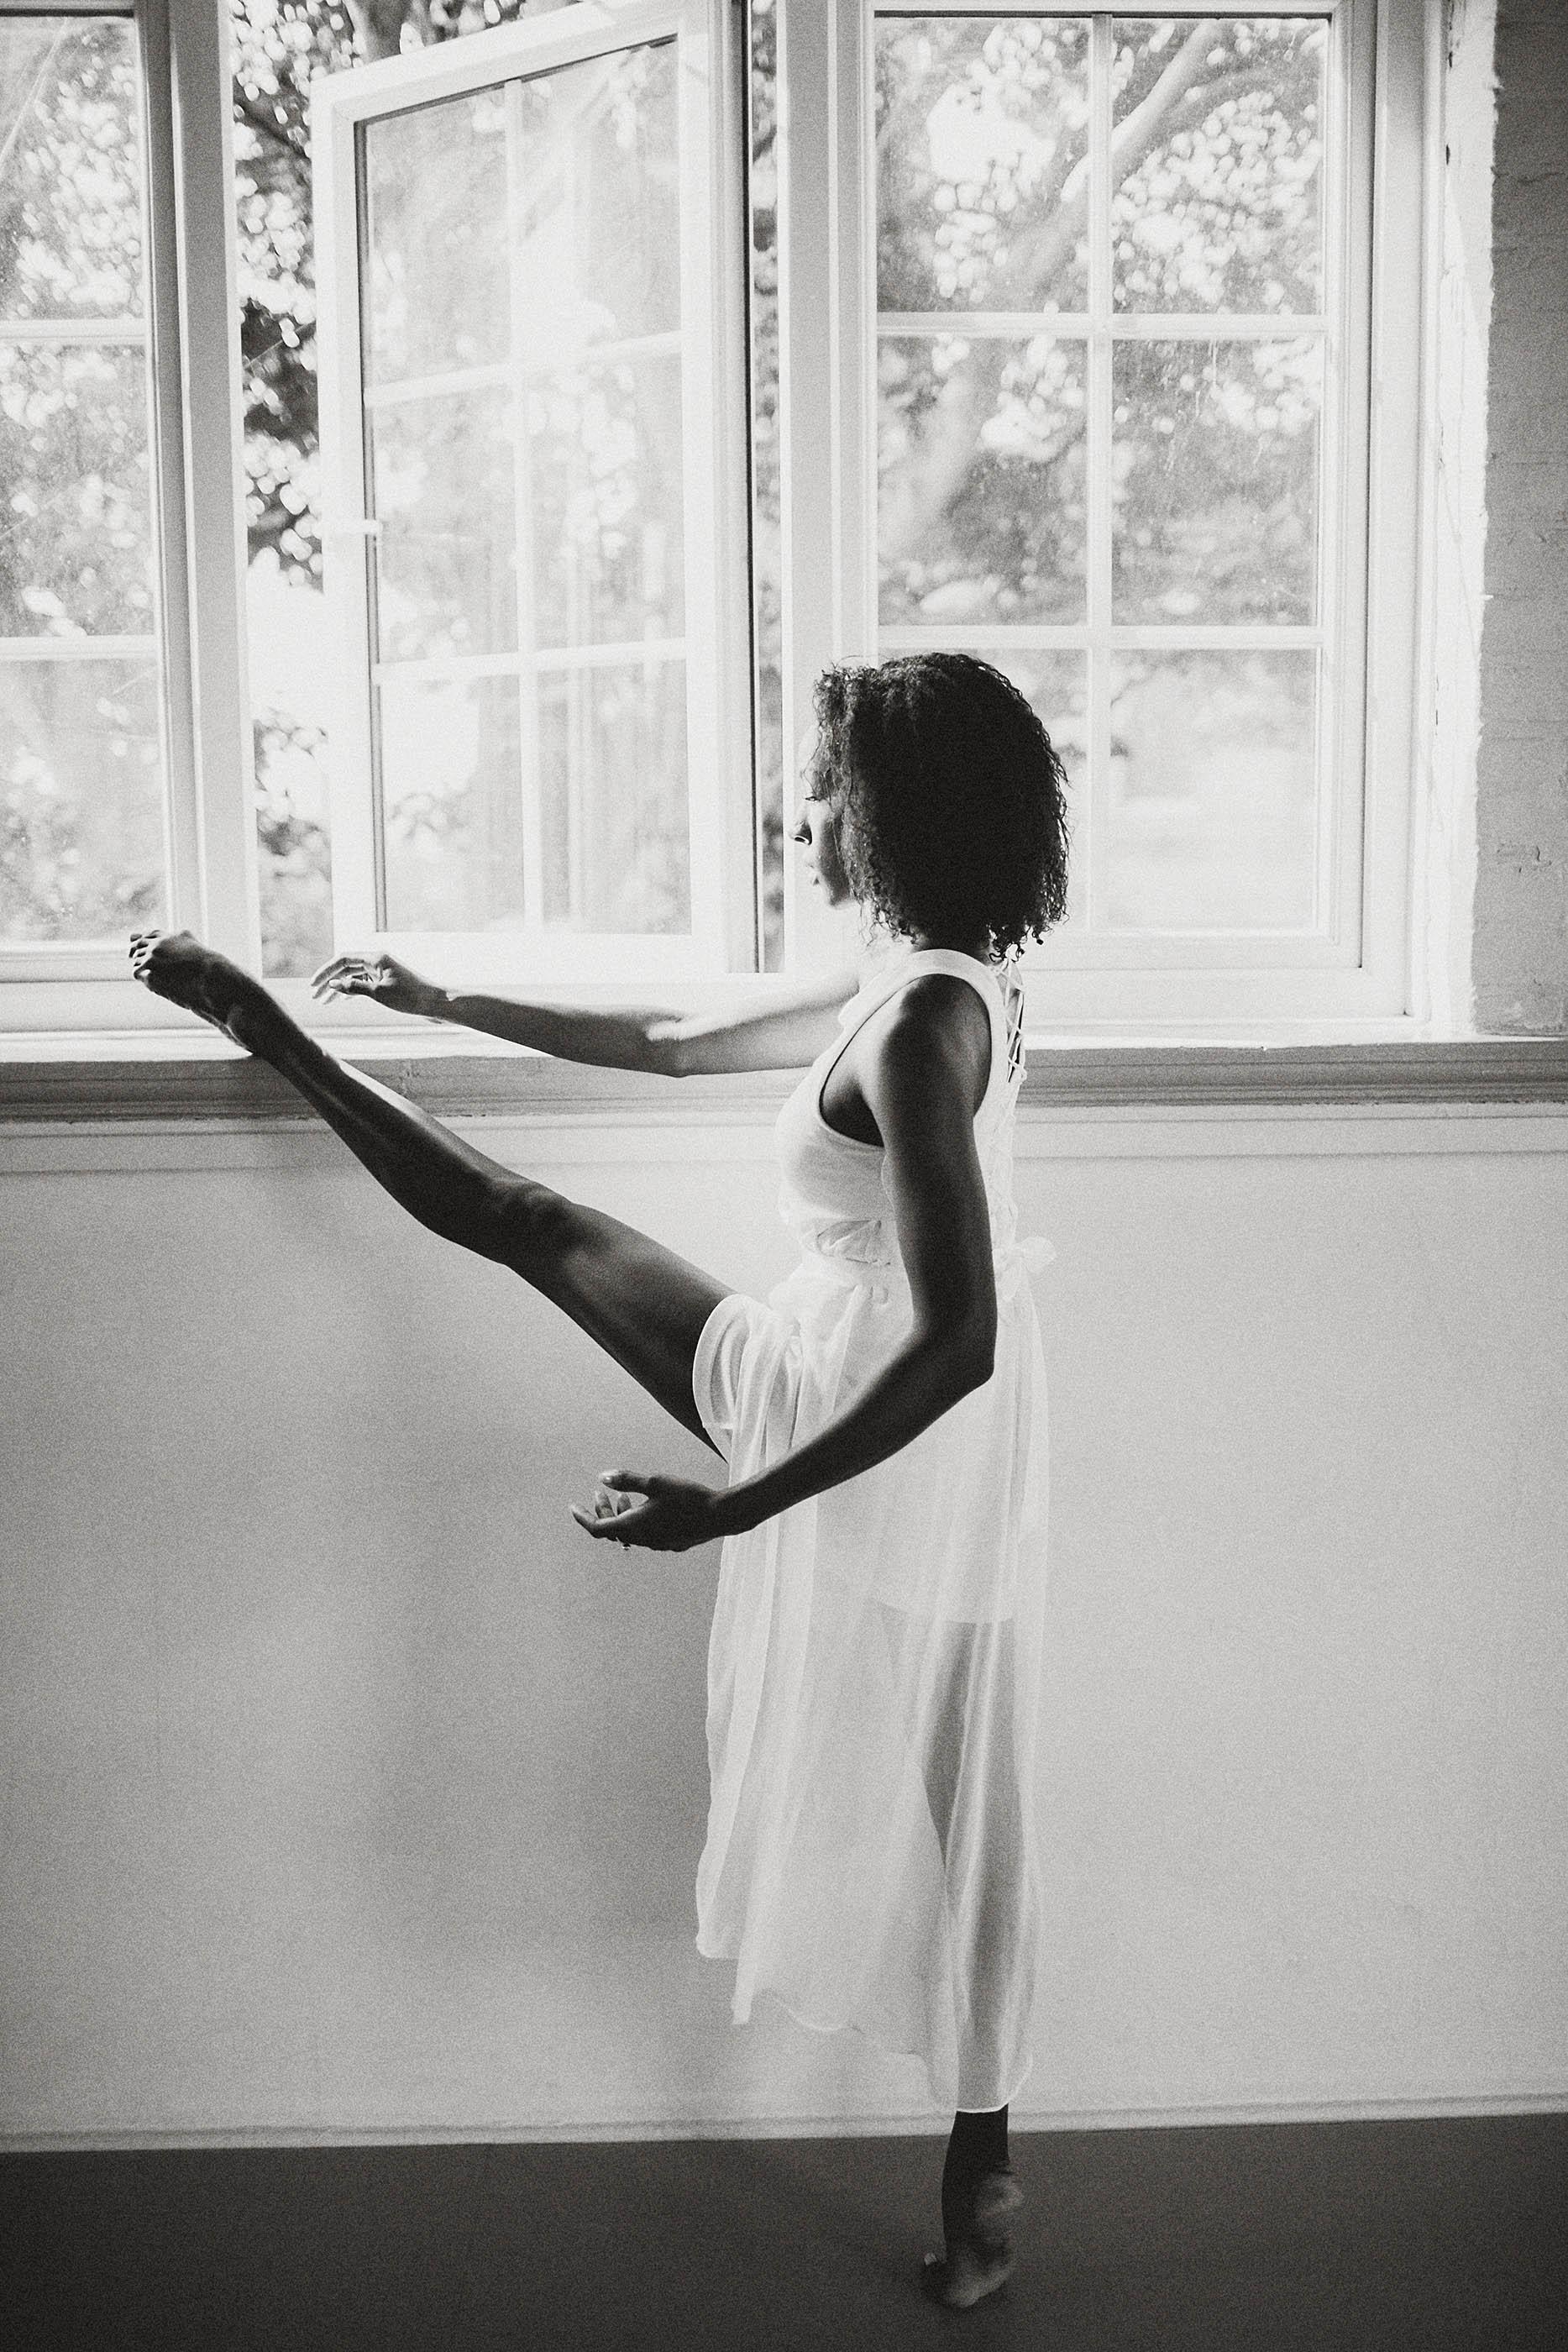 The Ballerina Nicholas Lau